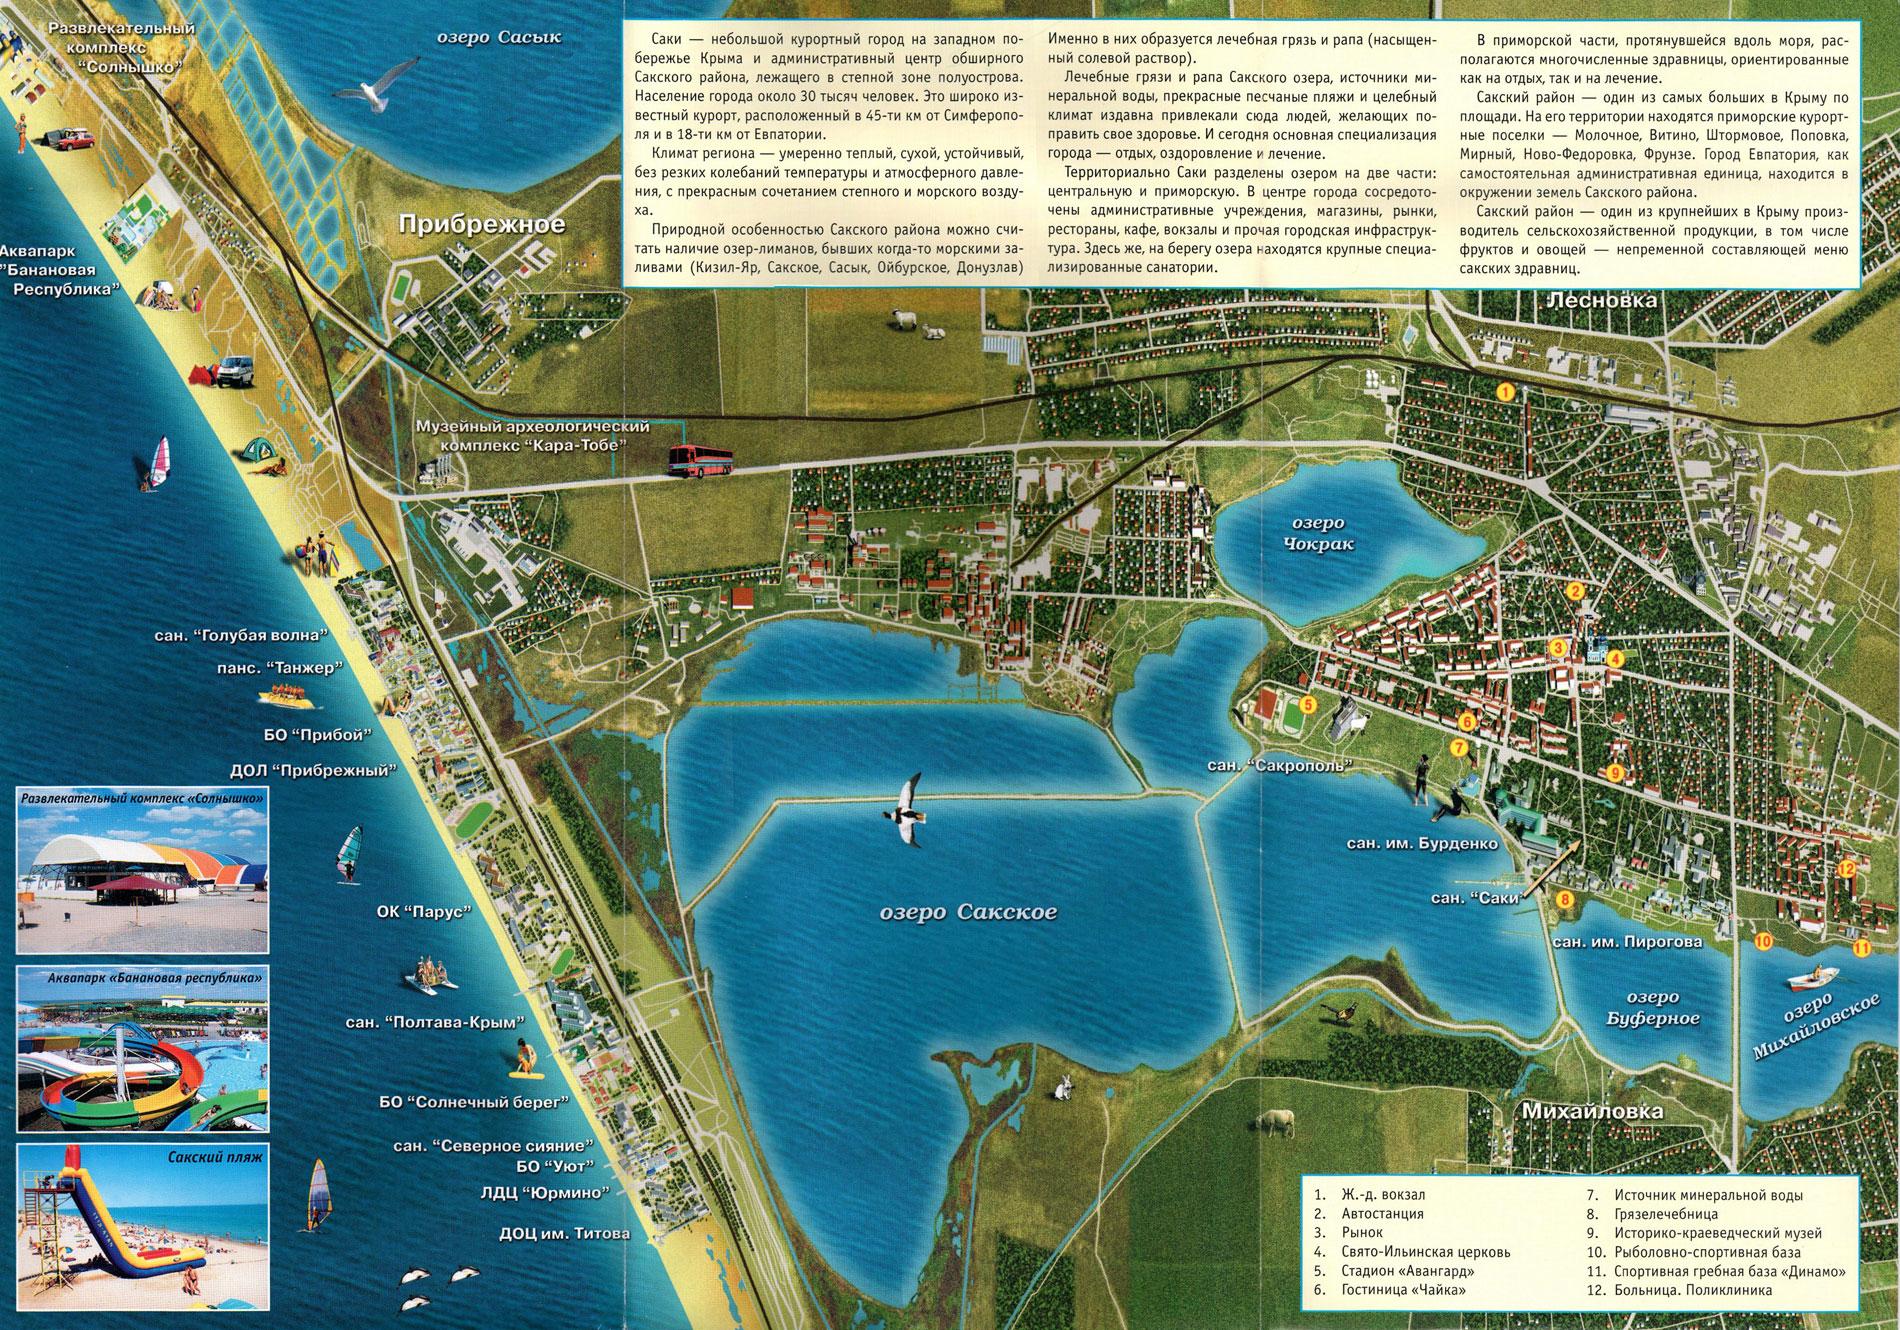 Подробная карта Саки с пляжами и санаториями